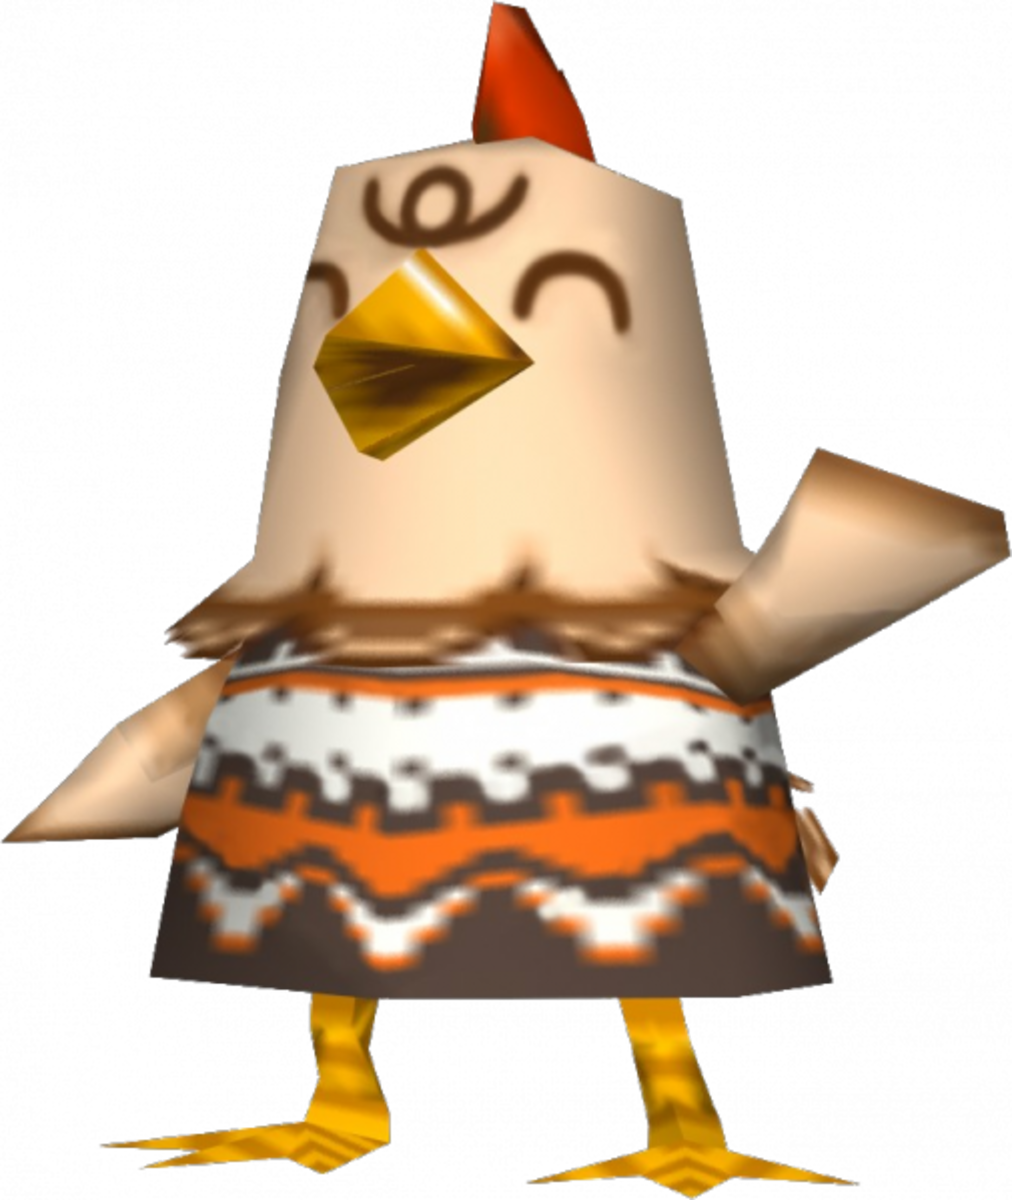 Betty the Chicken